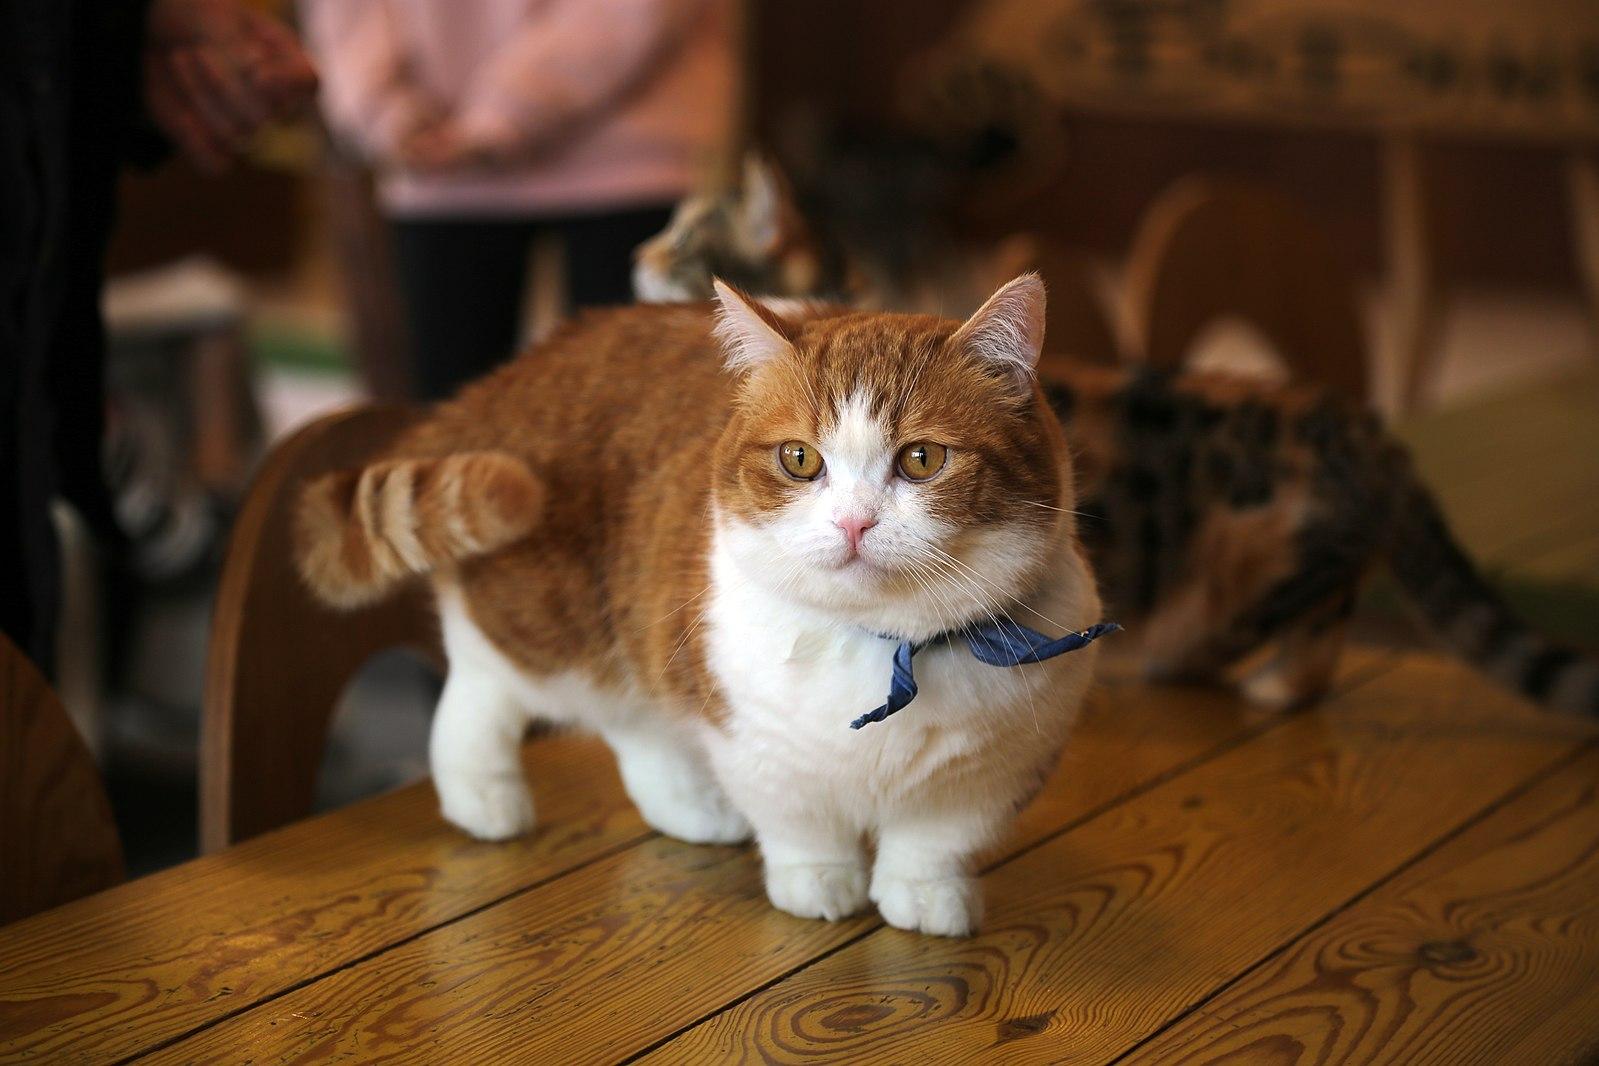 Munchkin Cats Adorable Or Controversial Catgazette